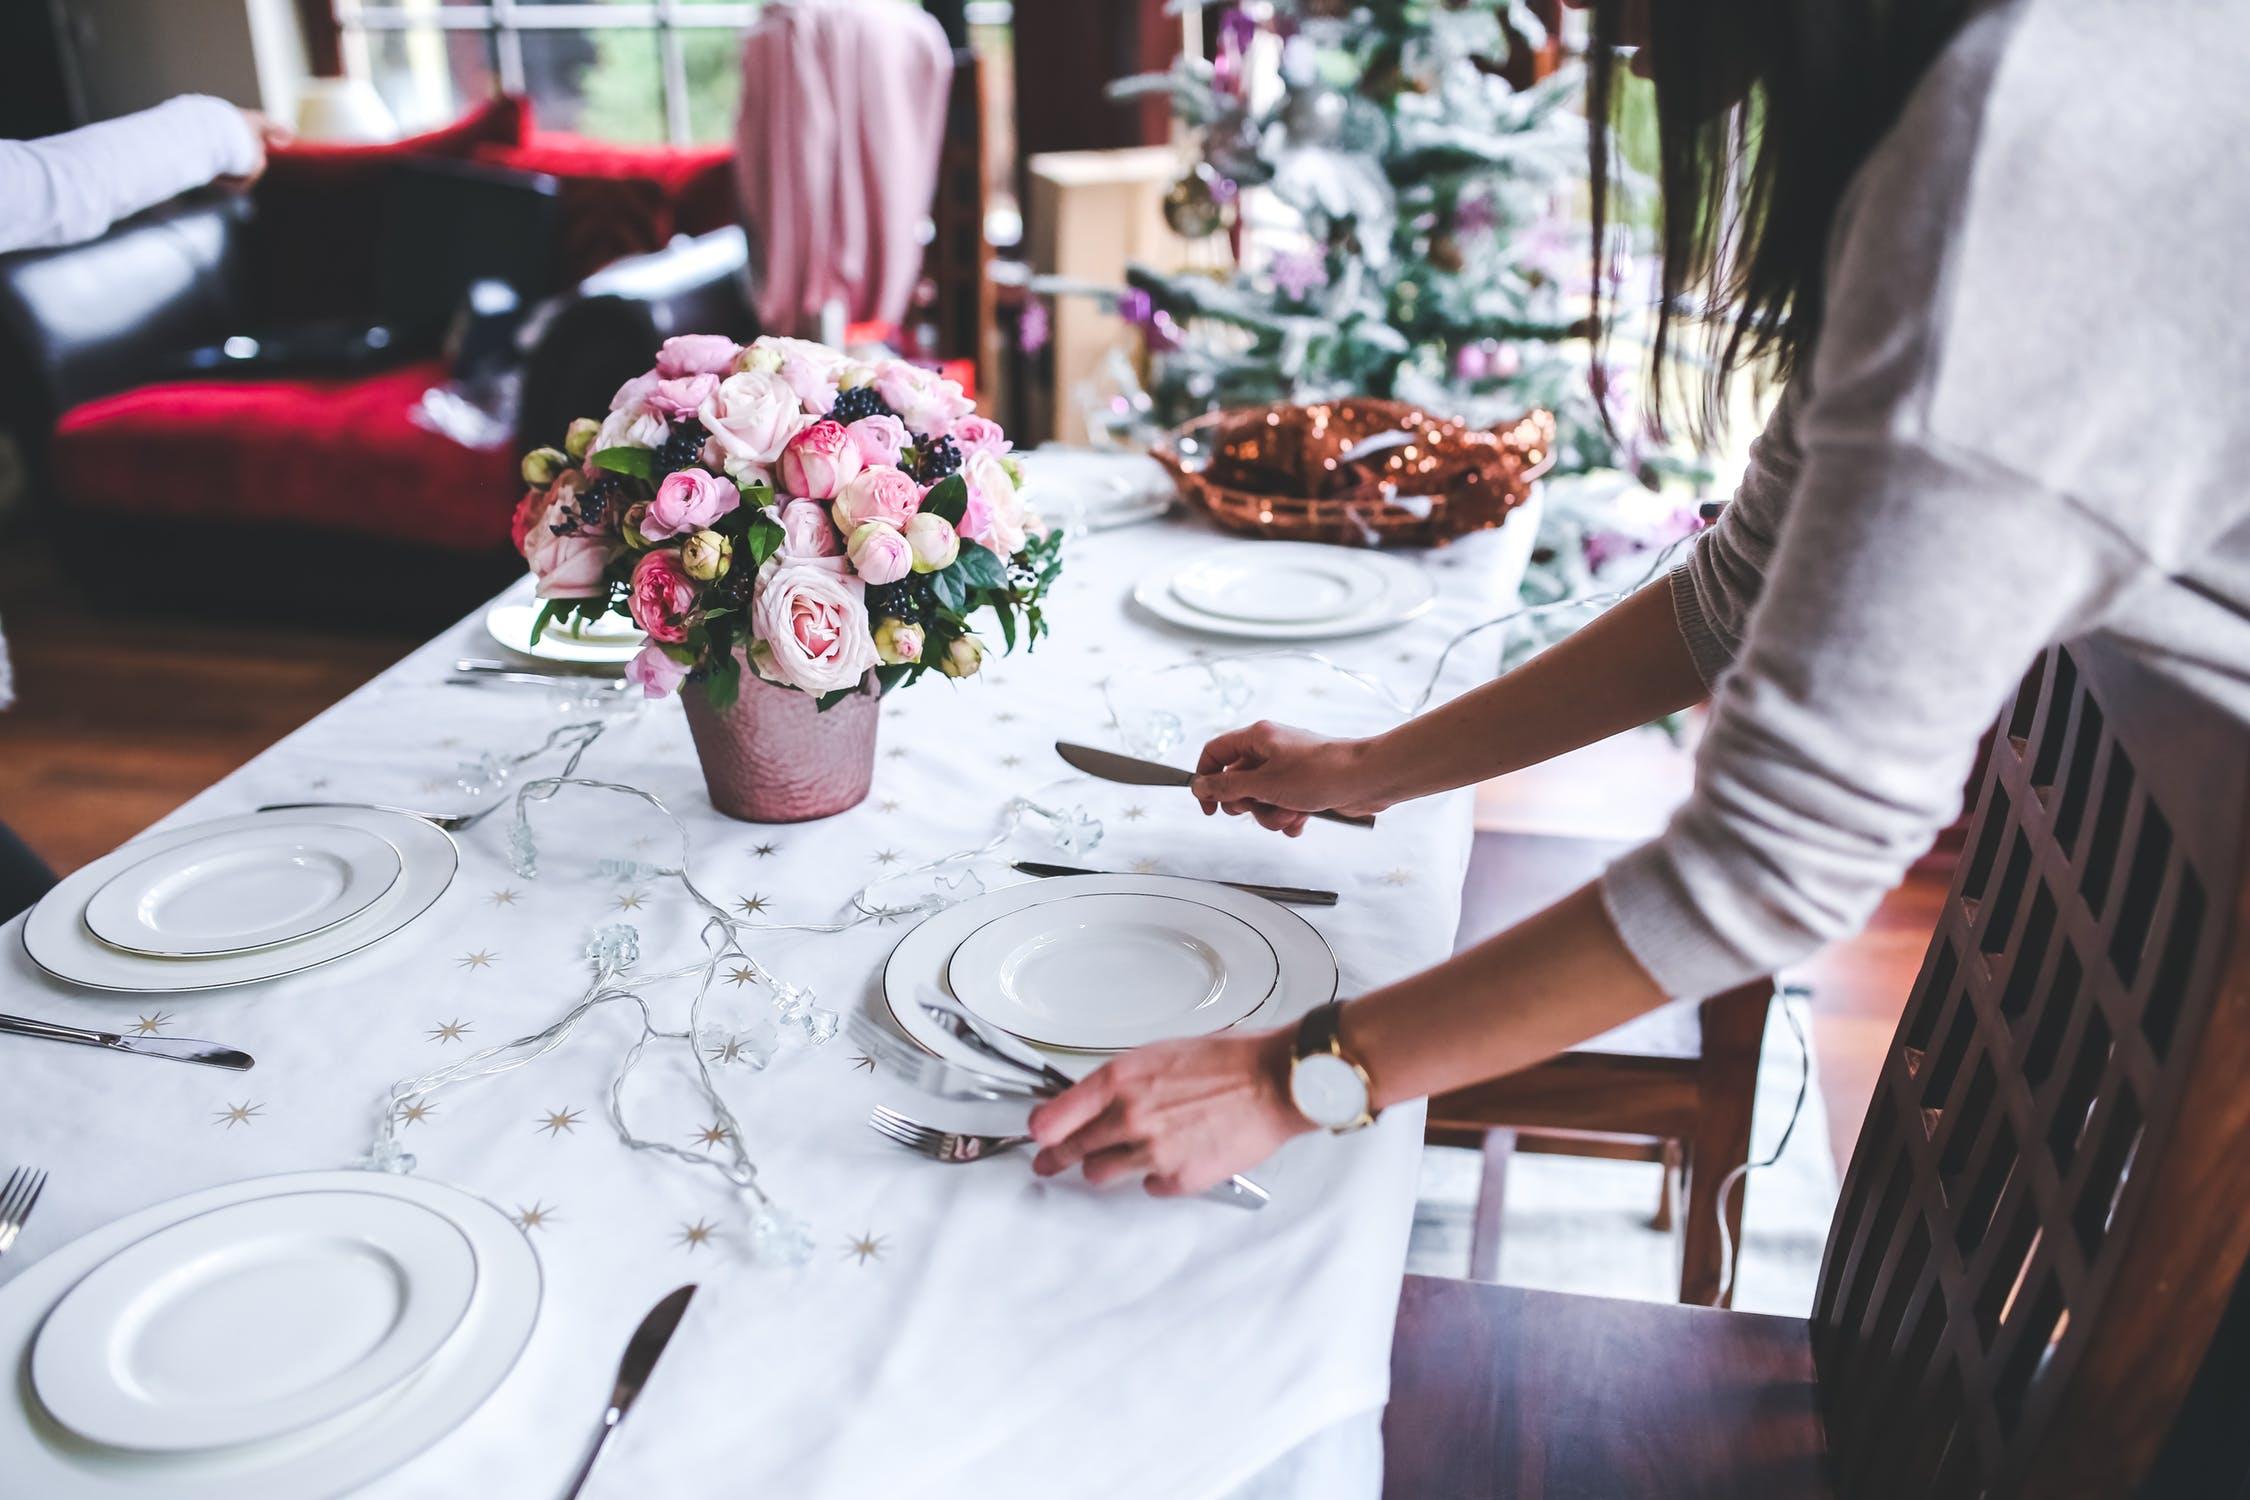 dinner table setup image